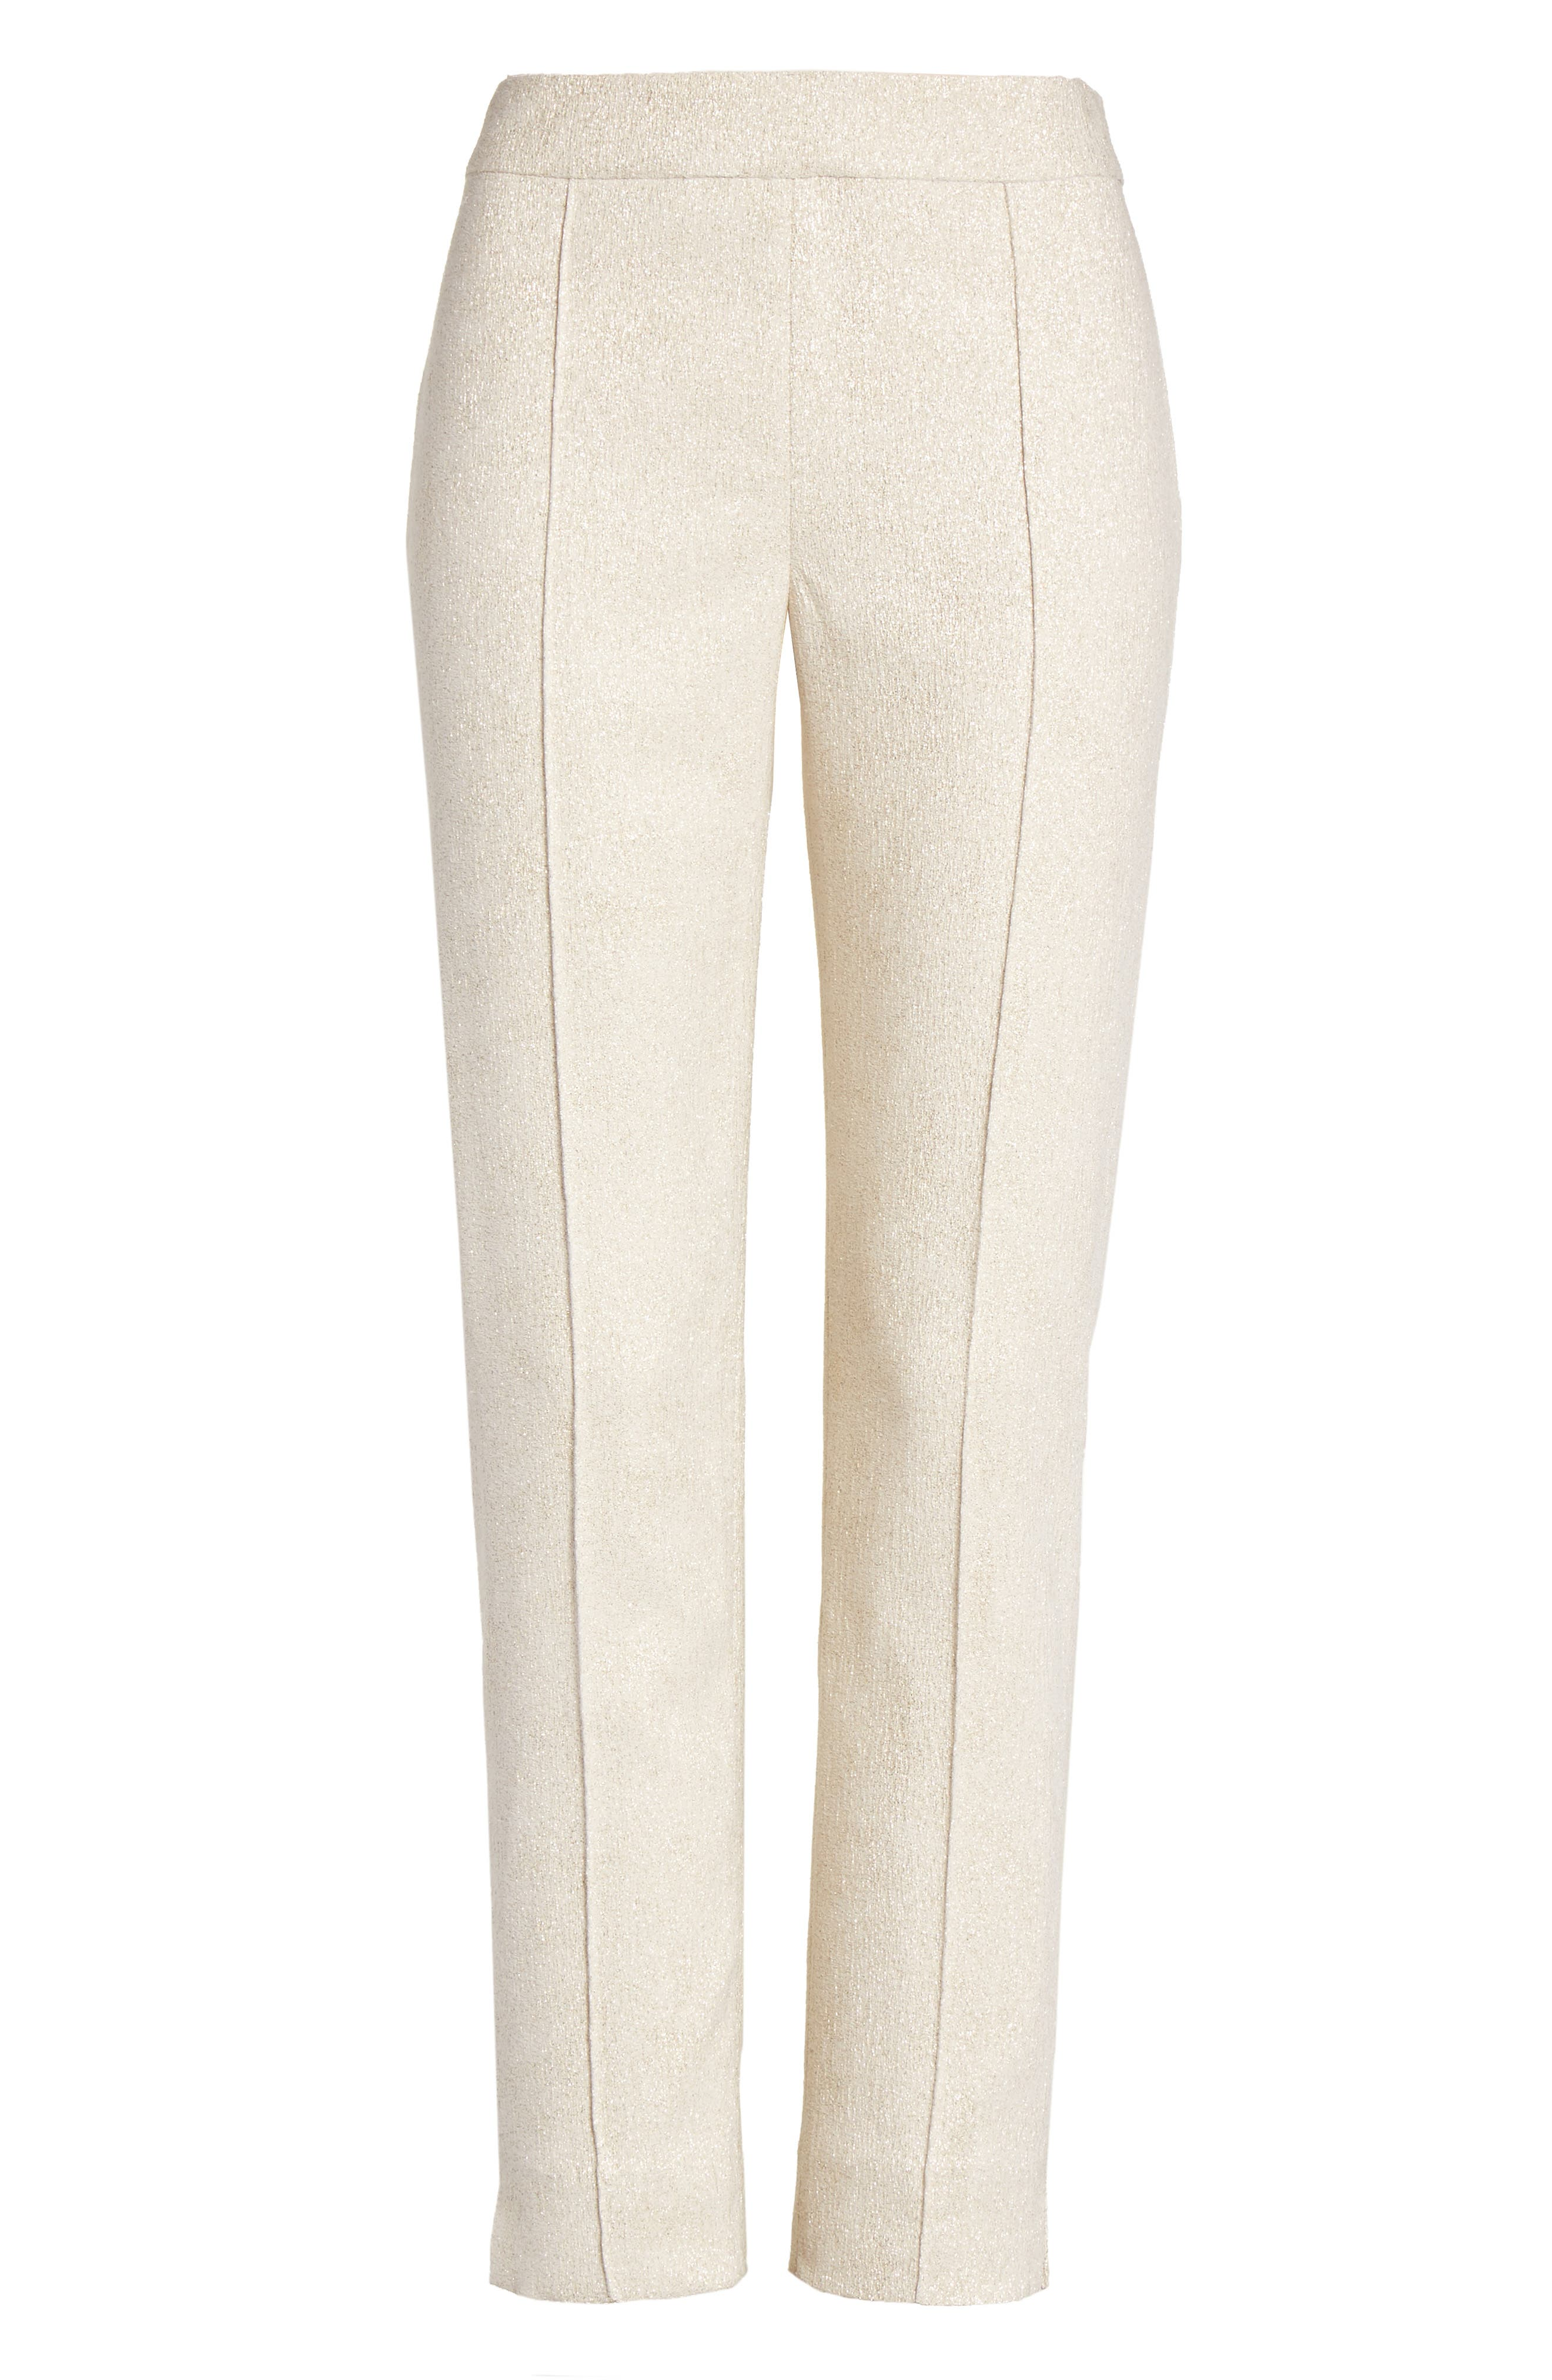 Metallic Jacquard Crop Pants,                             Alternate thumbnail 7, color,                             Bianco/ Gold